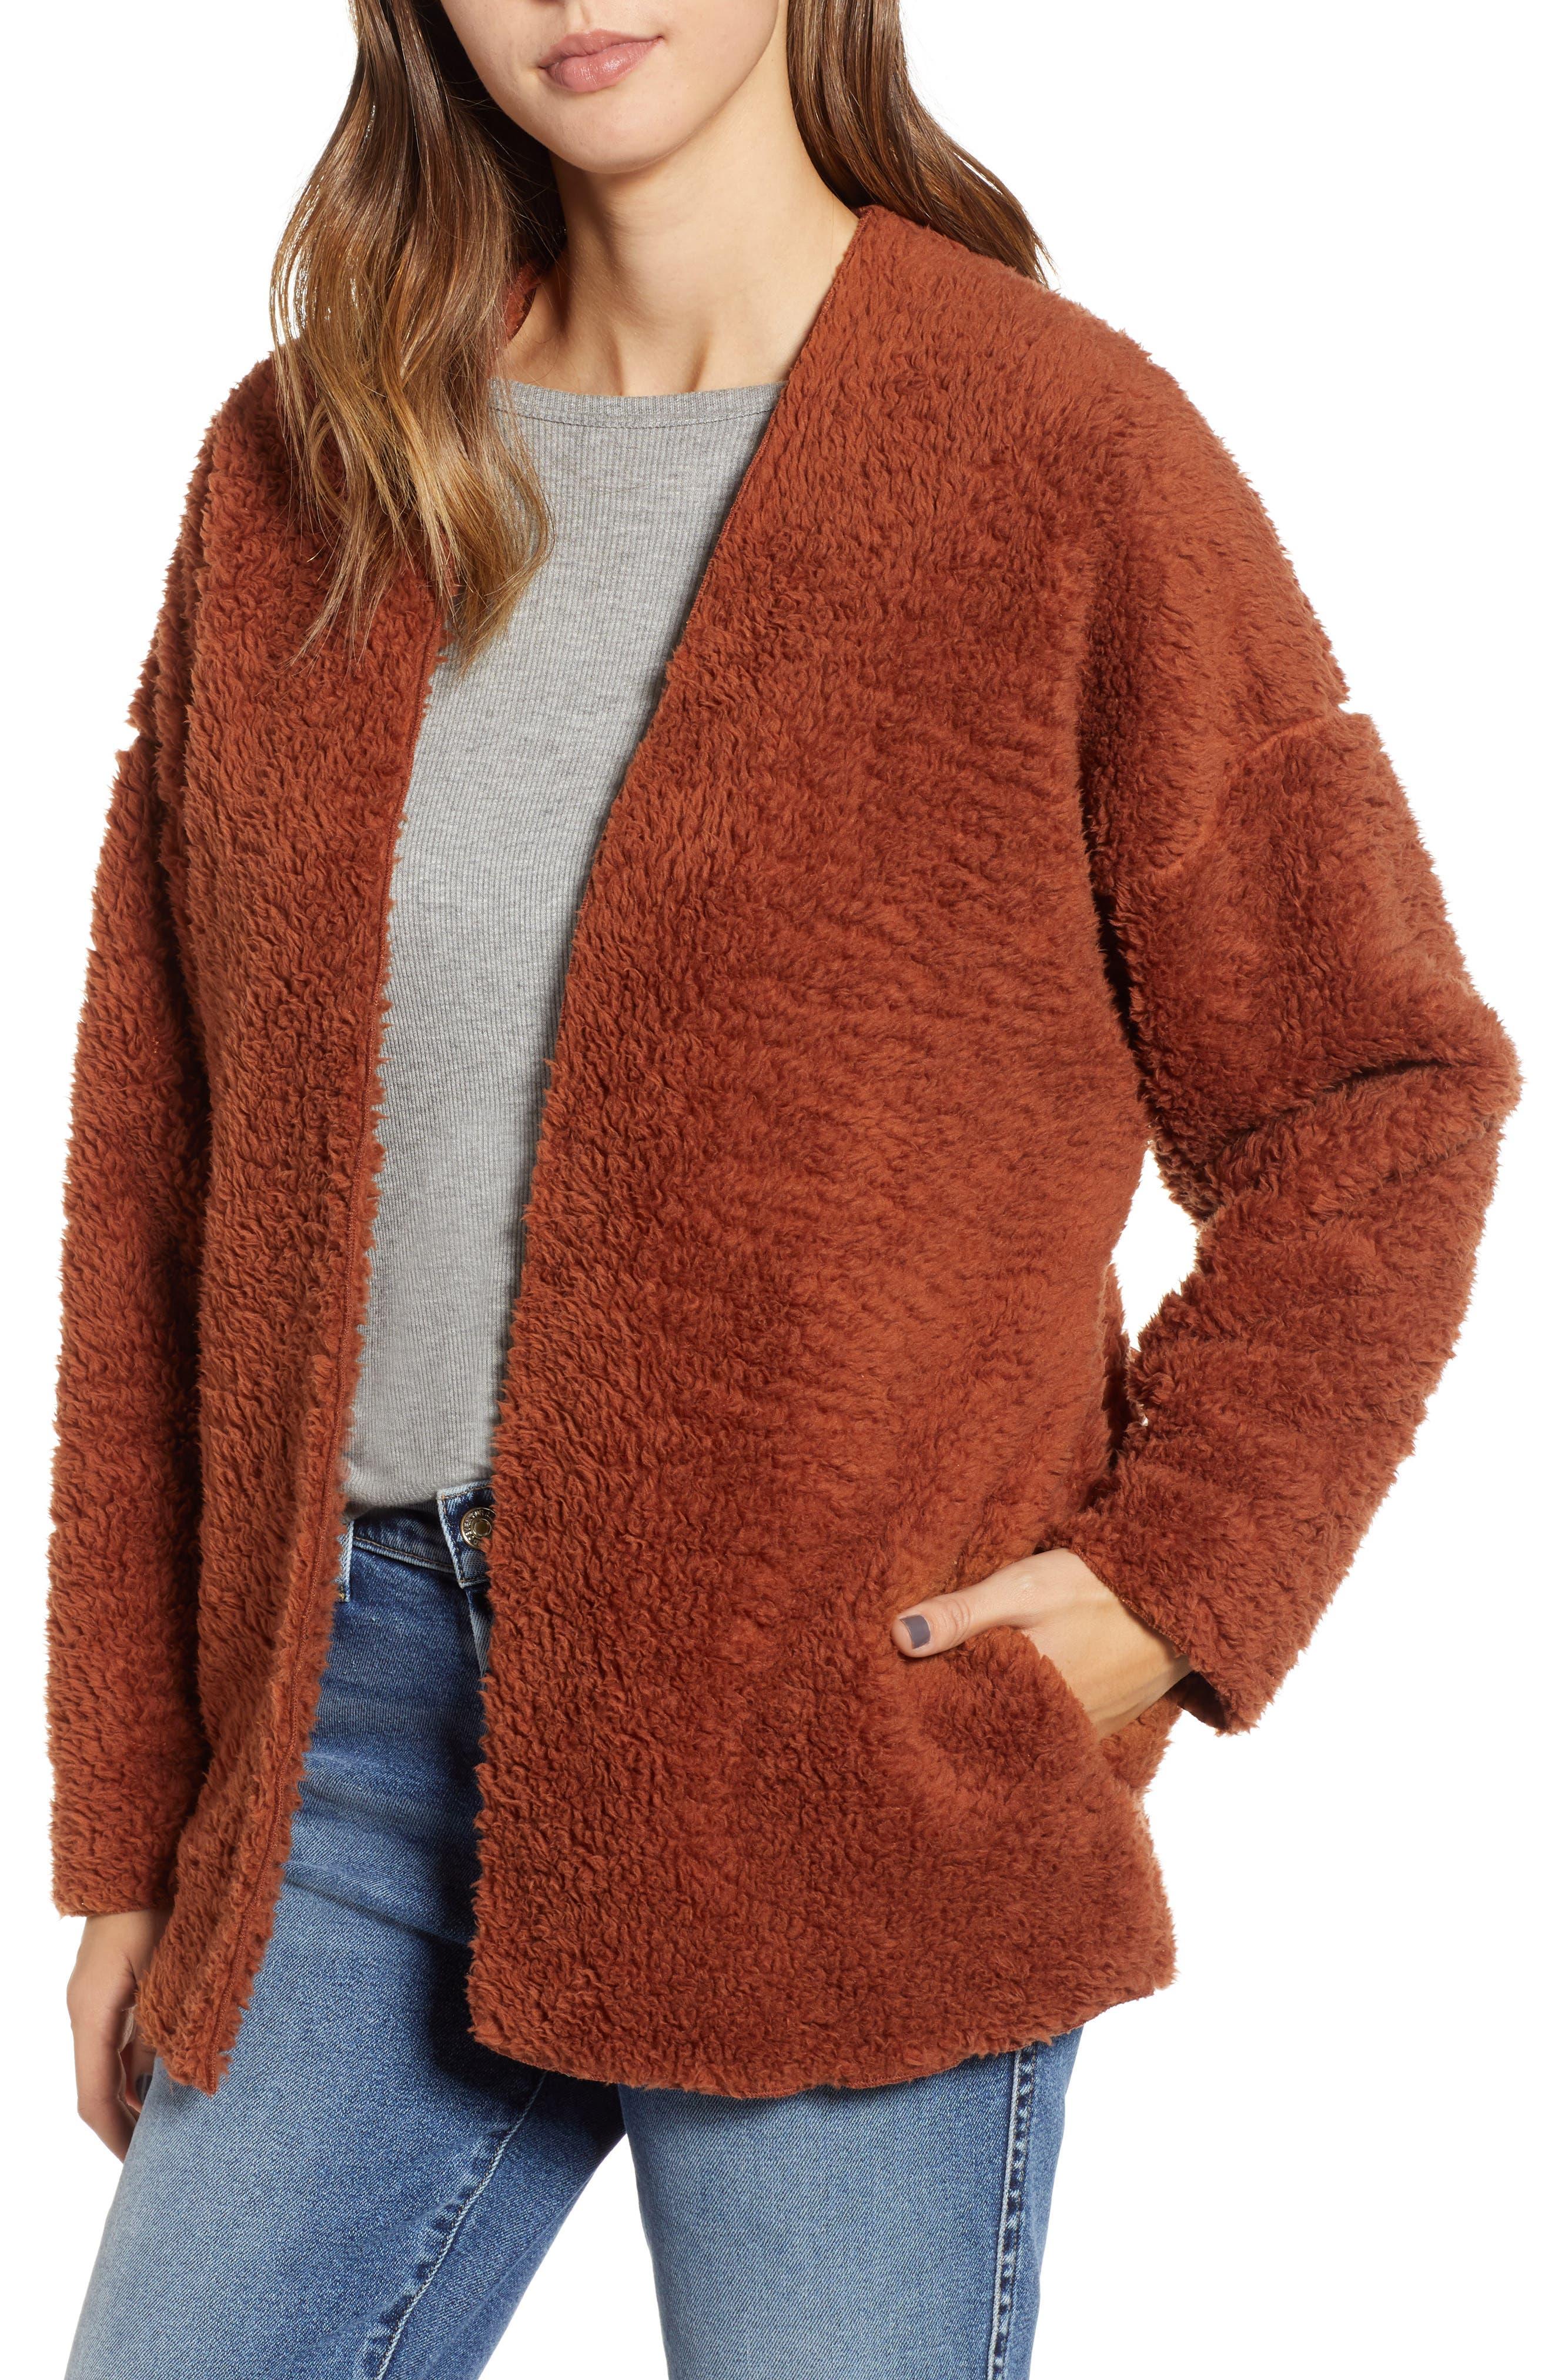 SOCIALITE, Cozy High Pile Fleece Jacket, Main thumbnail 1, color, 200